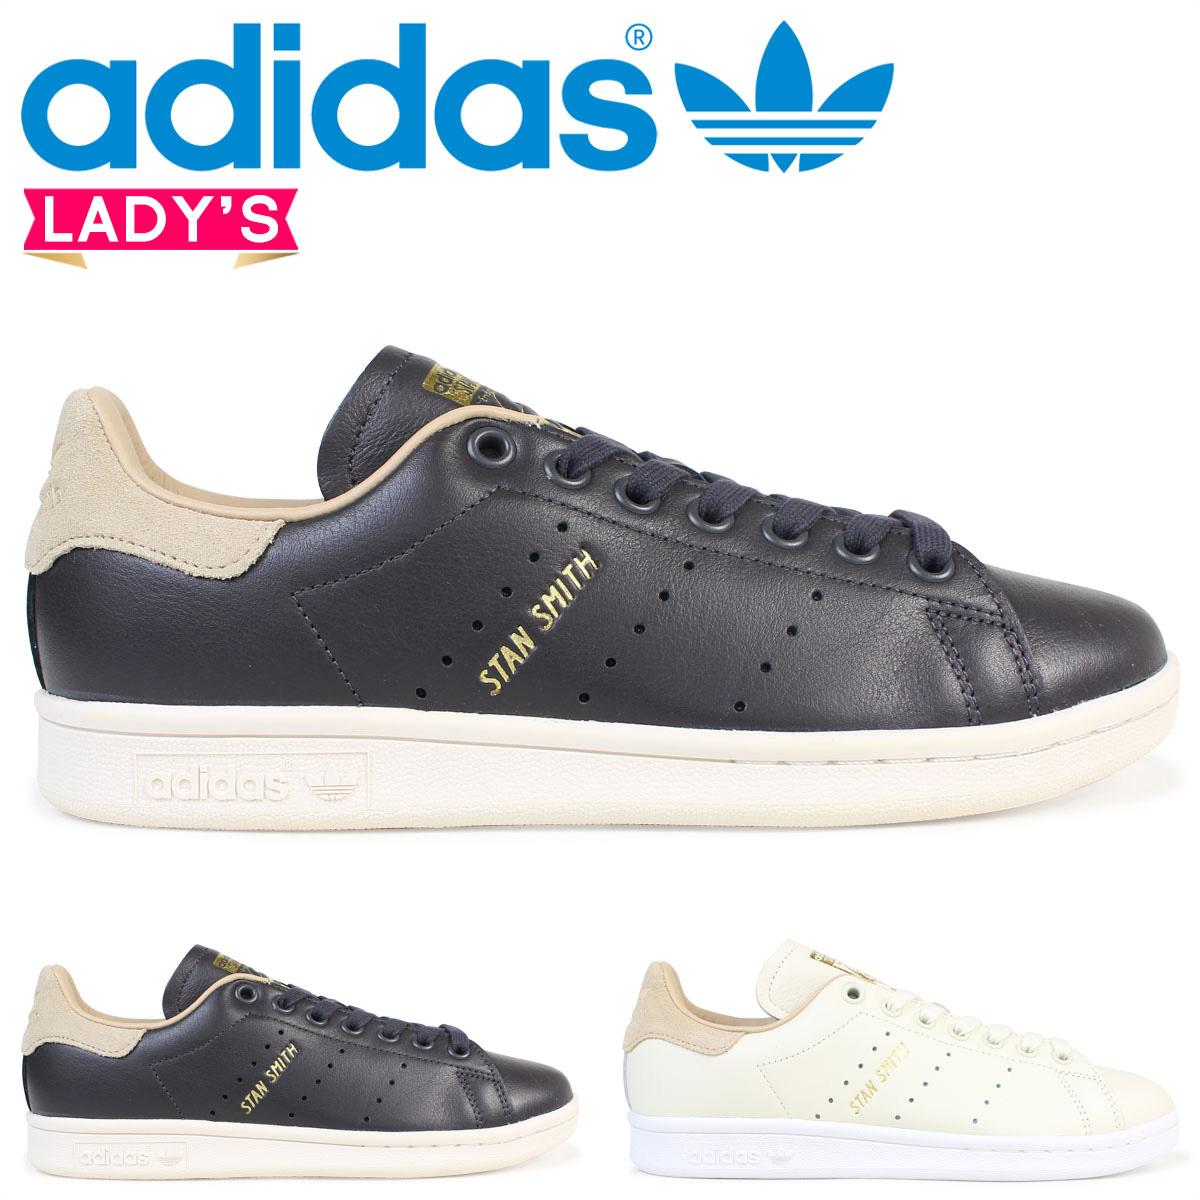 SneaK Online Shop | Rakuten Global Market: Adidas Stan Smith Lady's adidas originals sneakers STAN SMITH W BB5164 BB5165 shoes originals [4/7 Shinnyu load]